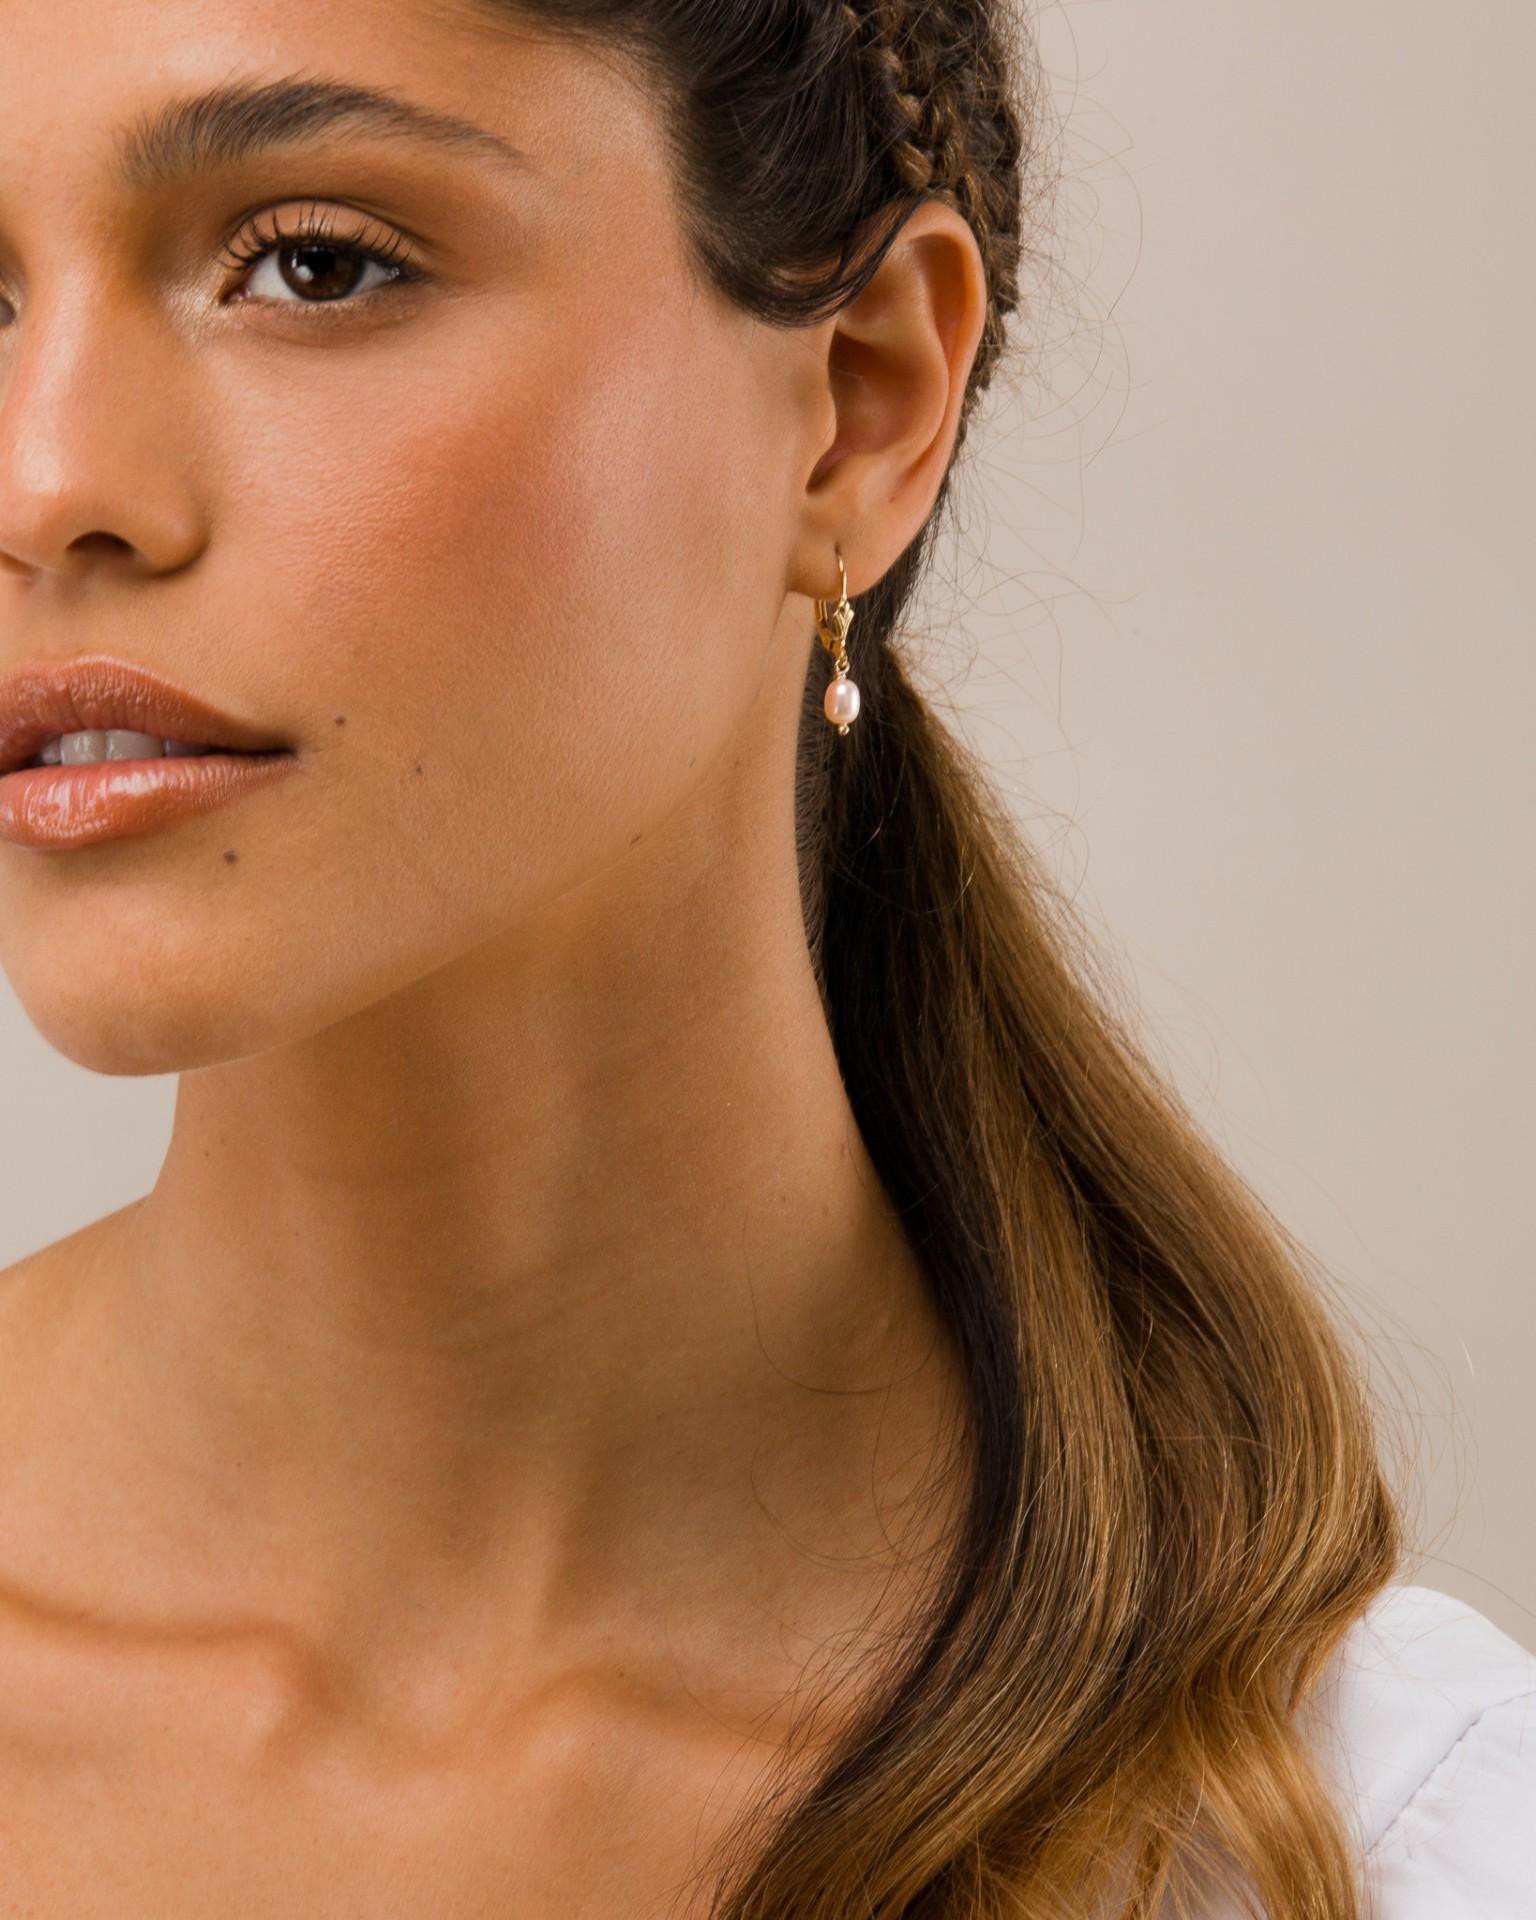 Peach Pearl Earrings - INSPIRATION HER